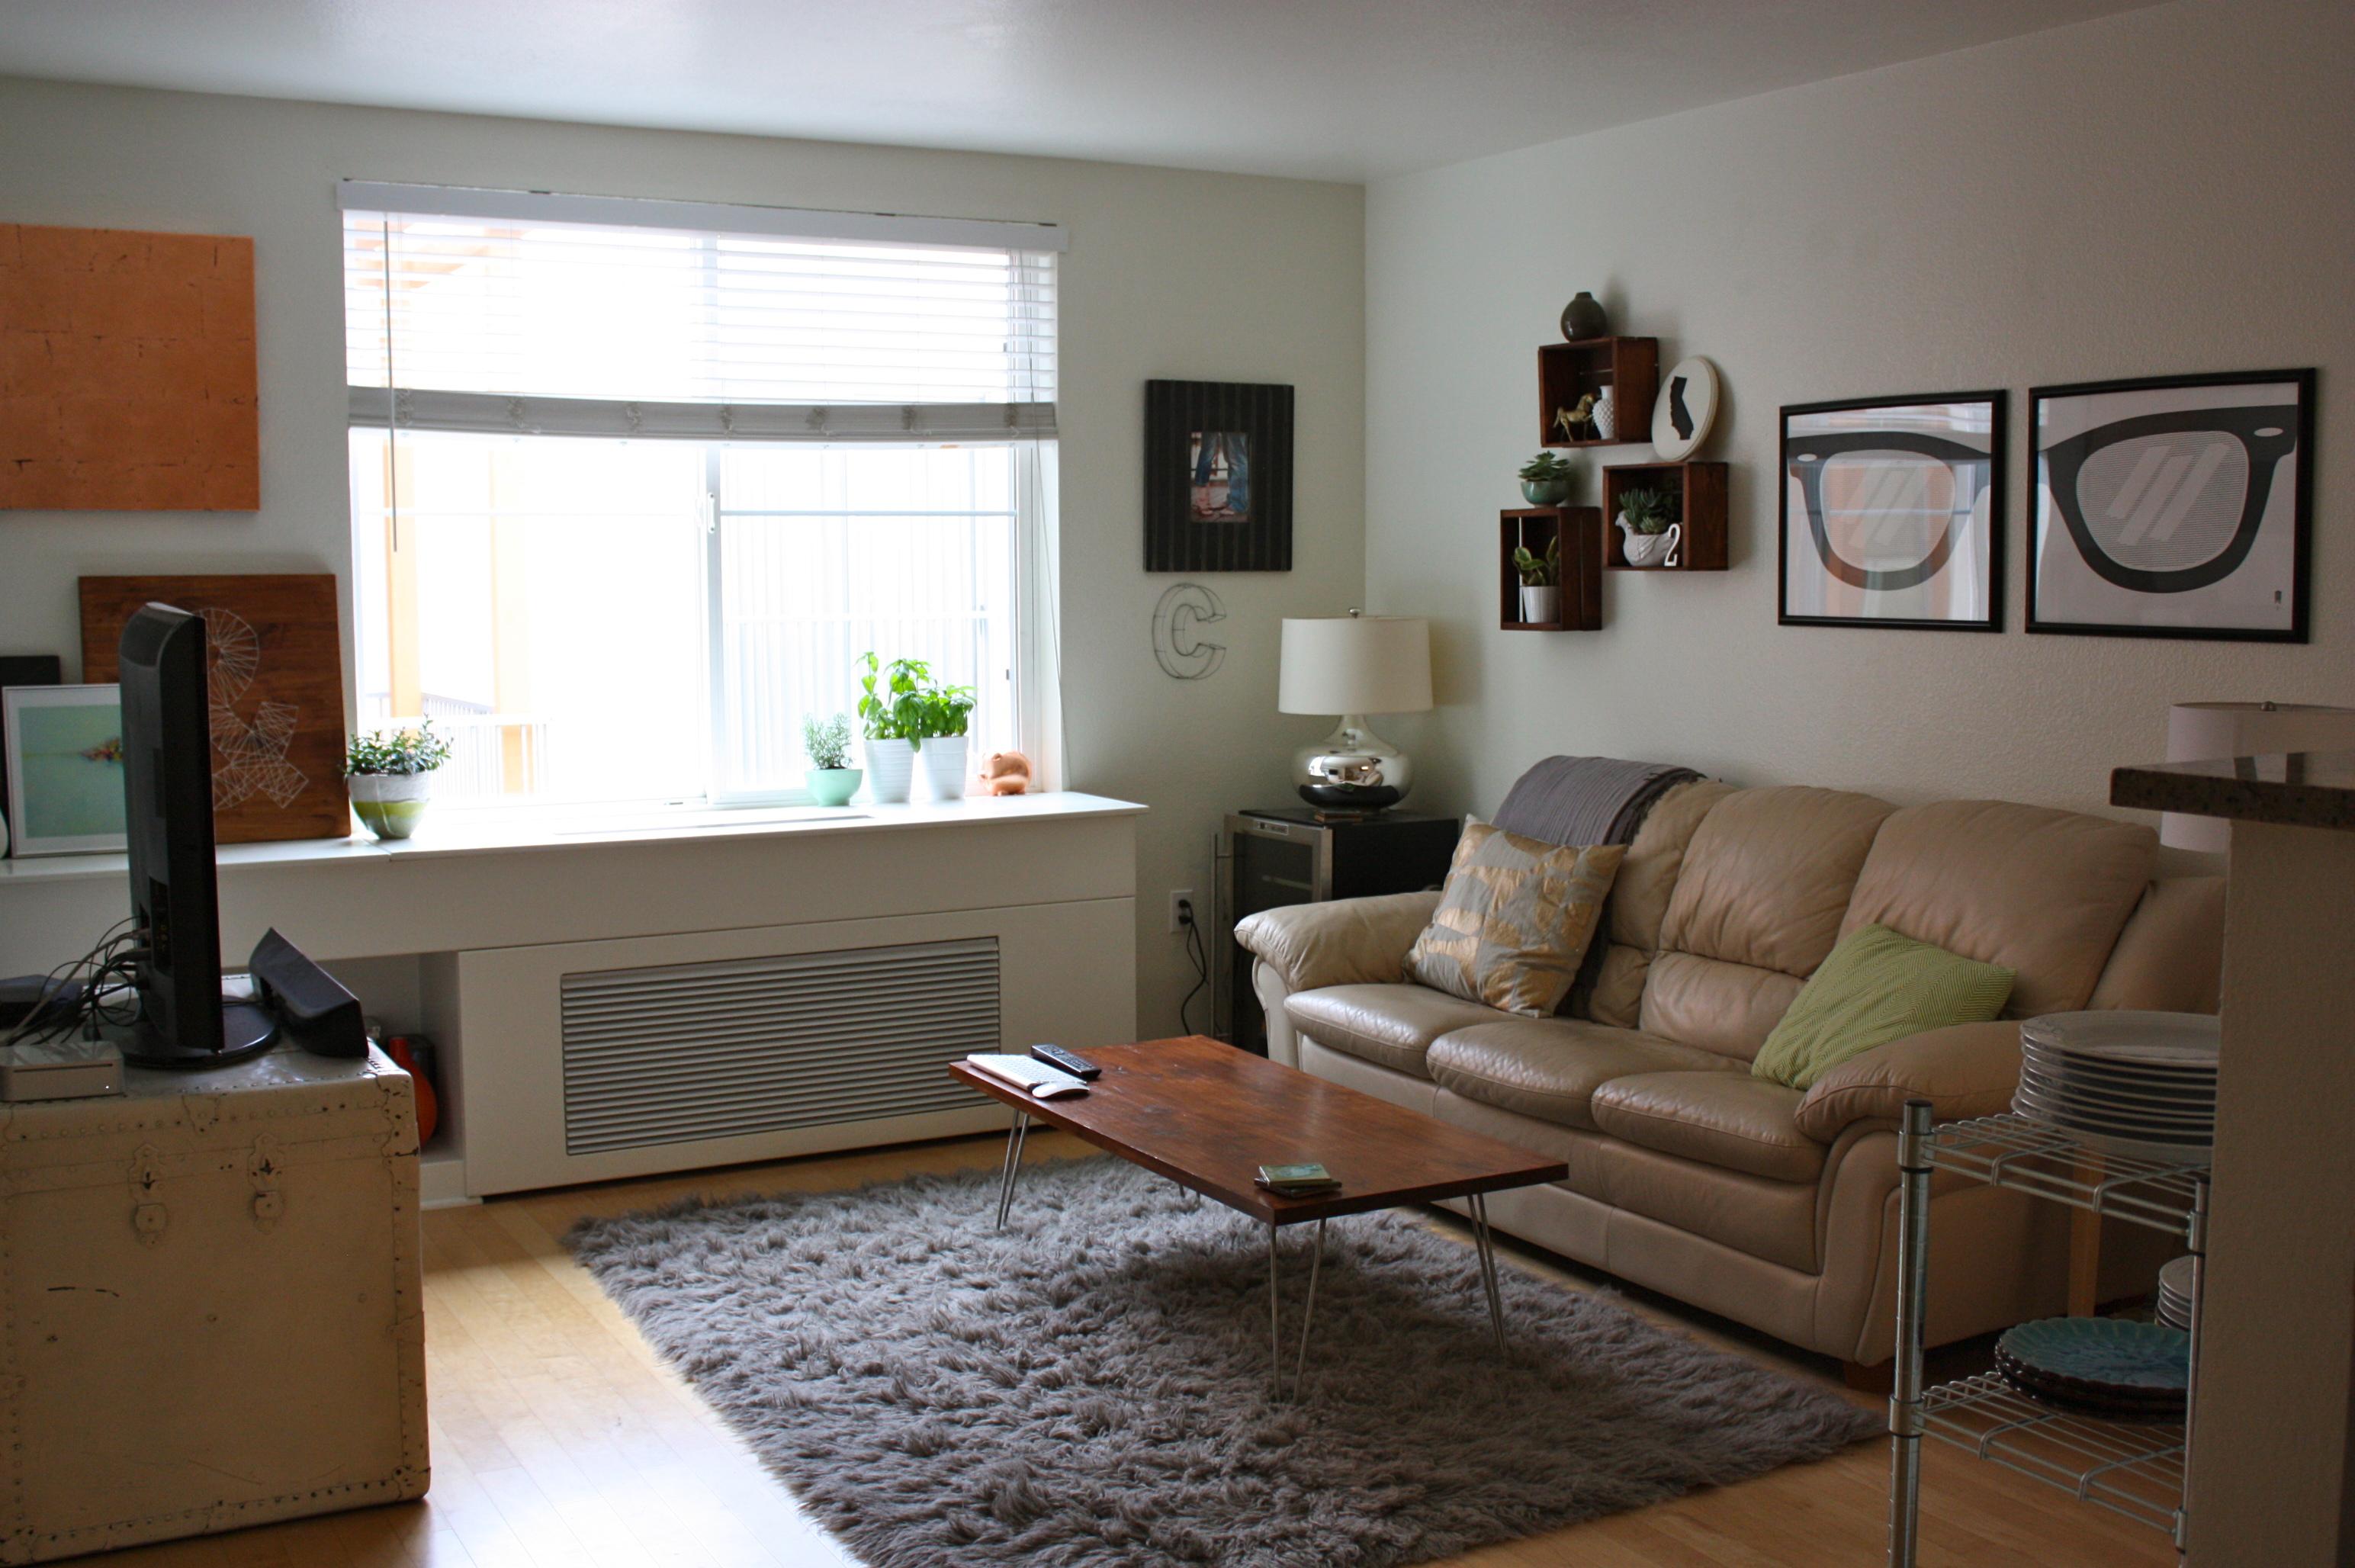 New Living Room Enjoy It By Elise Blaha Cripe New Living Room Dining Nook